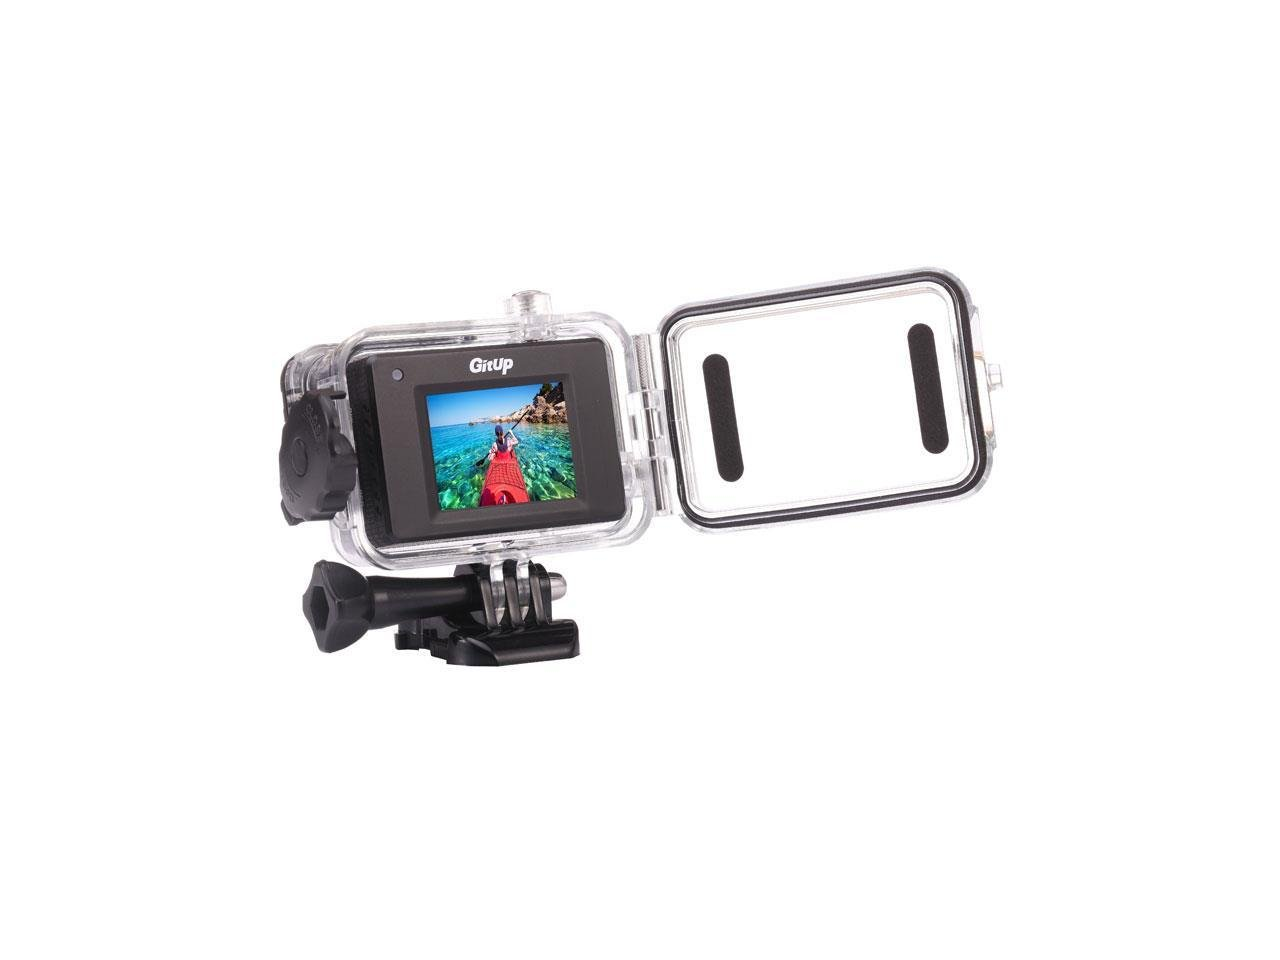 GIT1 Action Camera - Pro Edition - 1080p HD + WiFi Functionality - Sony IMX322 Sensor Spy Tec GIT1_Pro